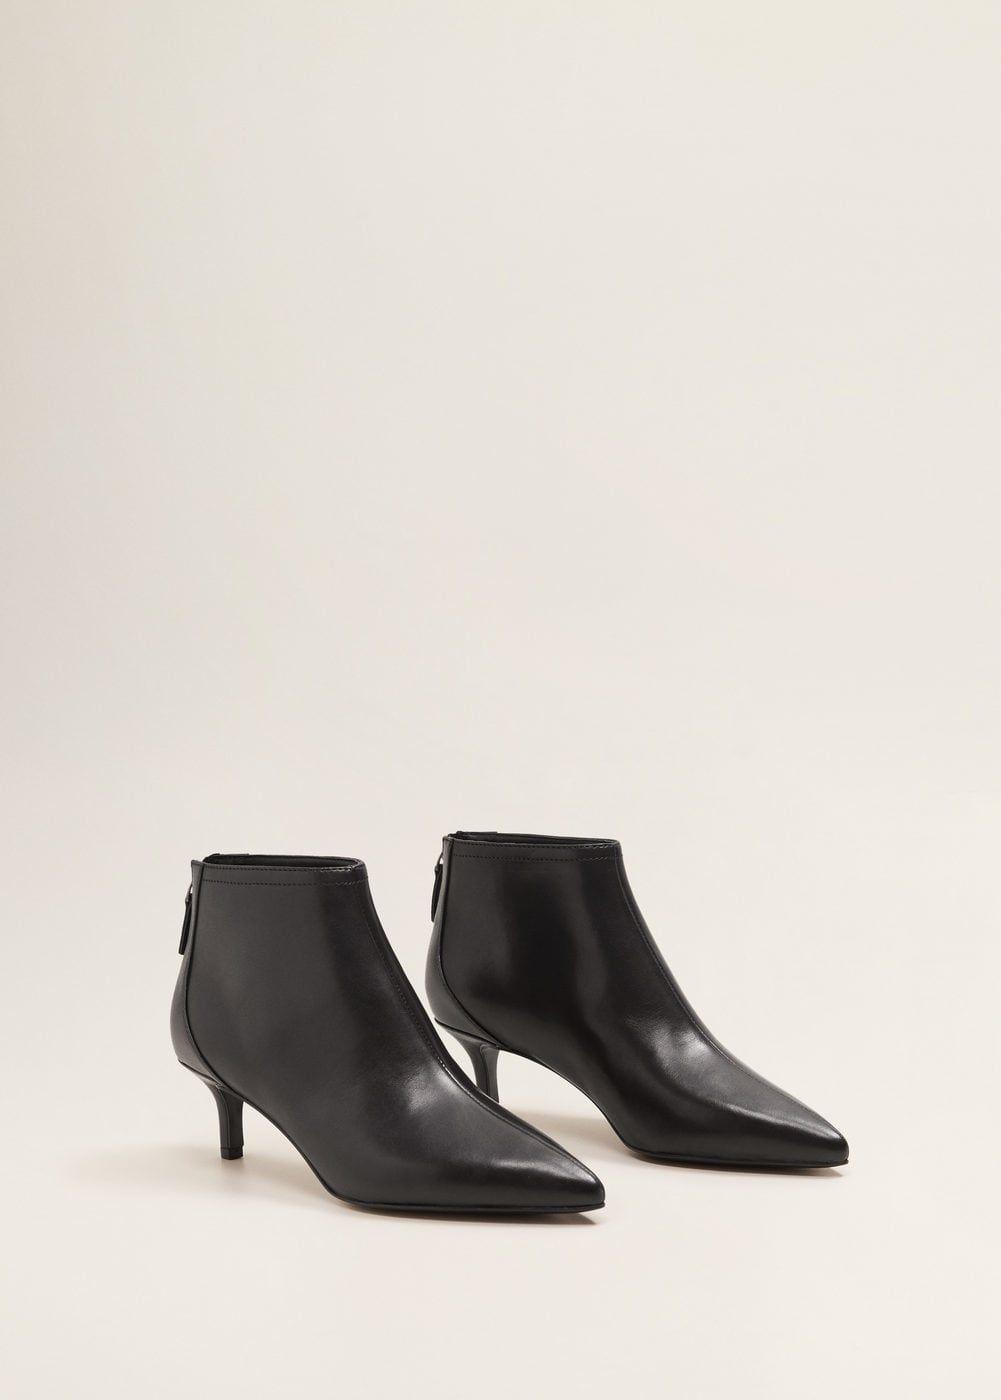 Midi Heel Leather Ankle Boot Women Mango United Kingdom Boots Kitten Heel Boots Leather Ankle Boots